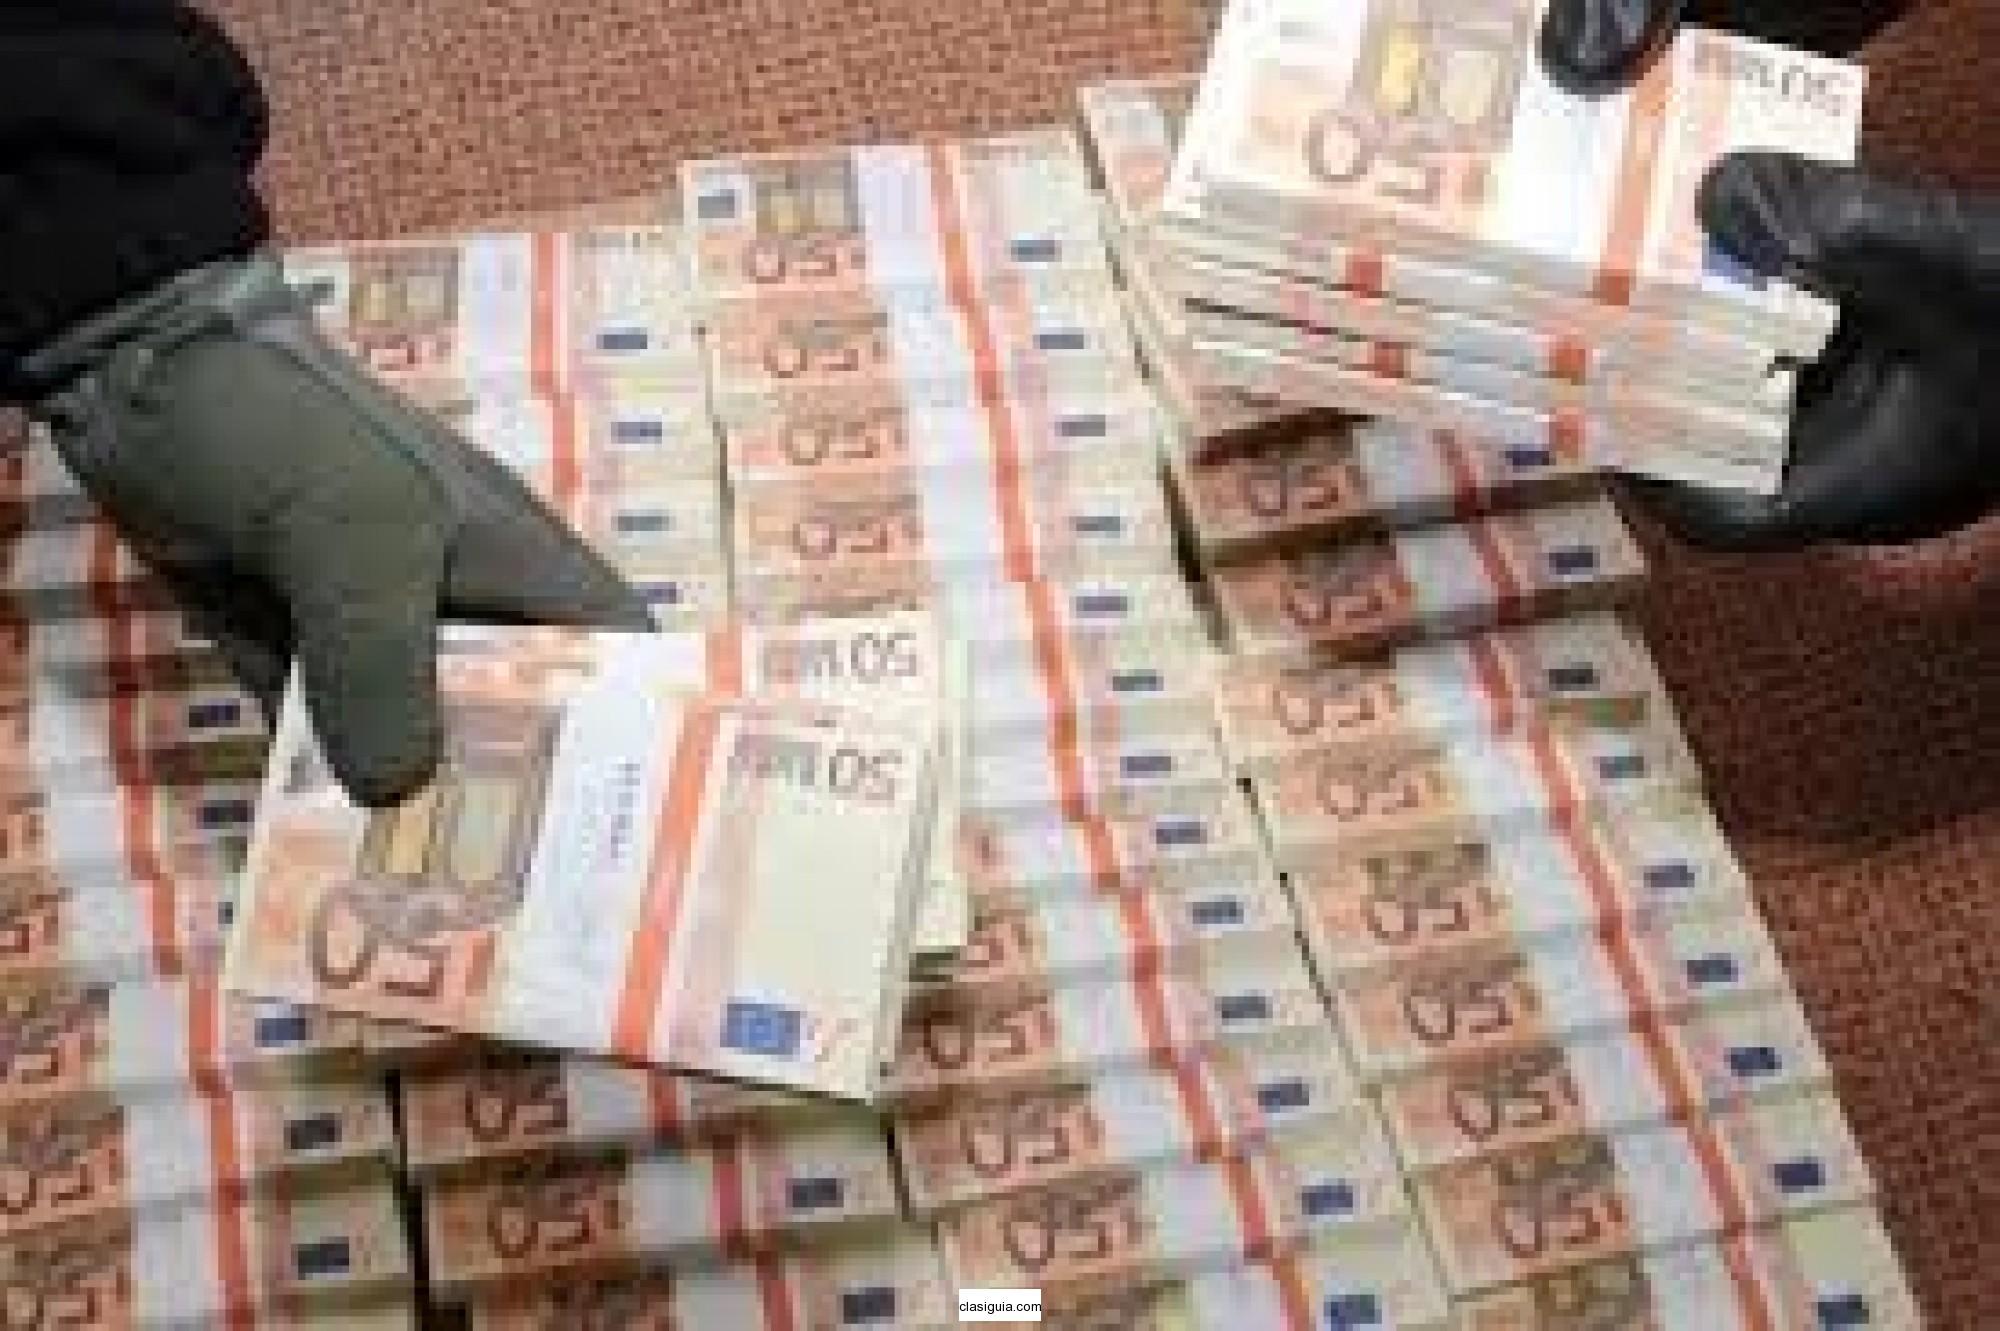 ofertas de préstamos de dinero a largo plazo